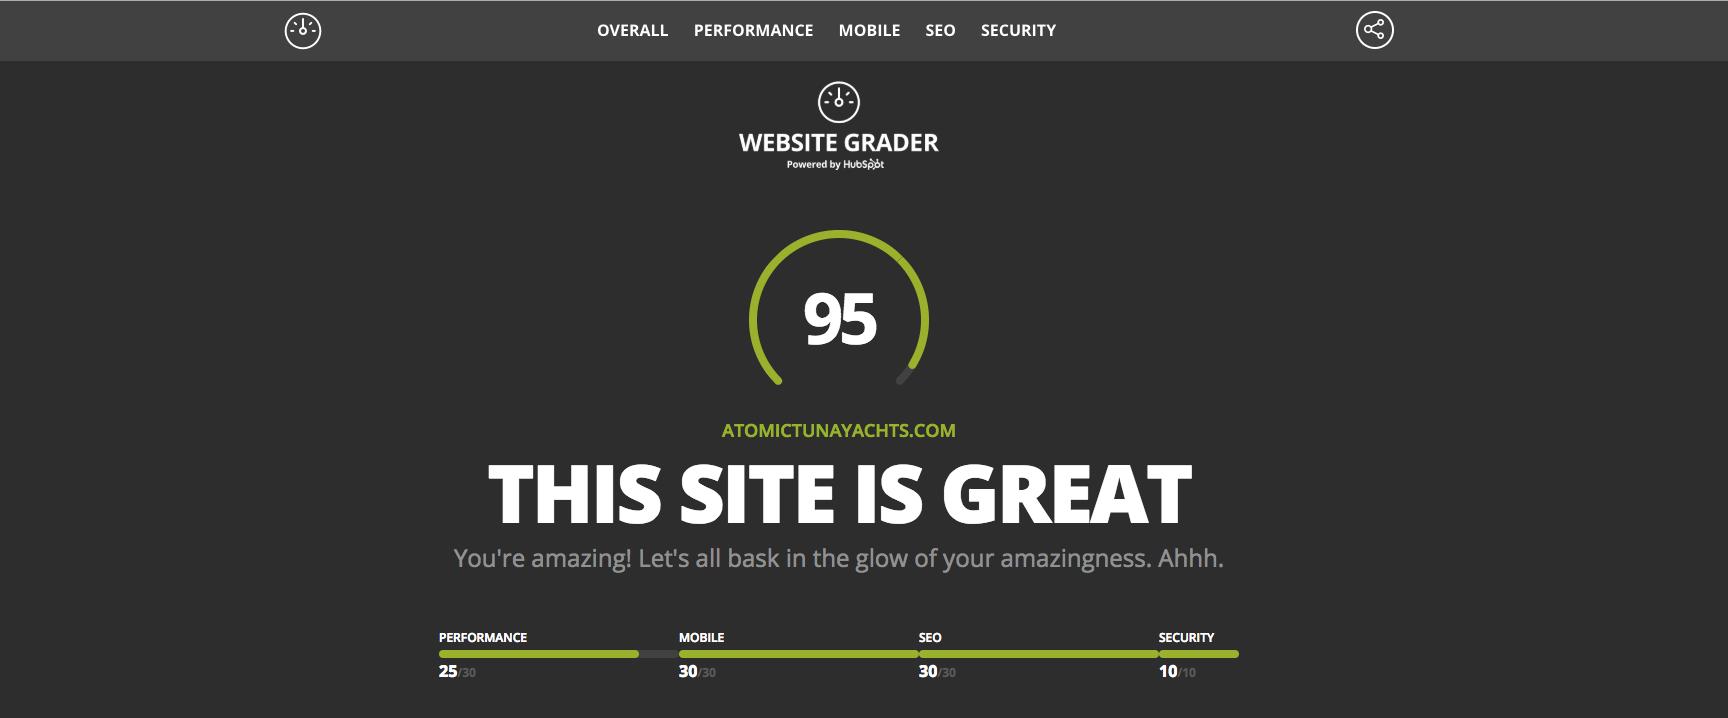 Onsite SEO - Website Grader